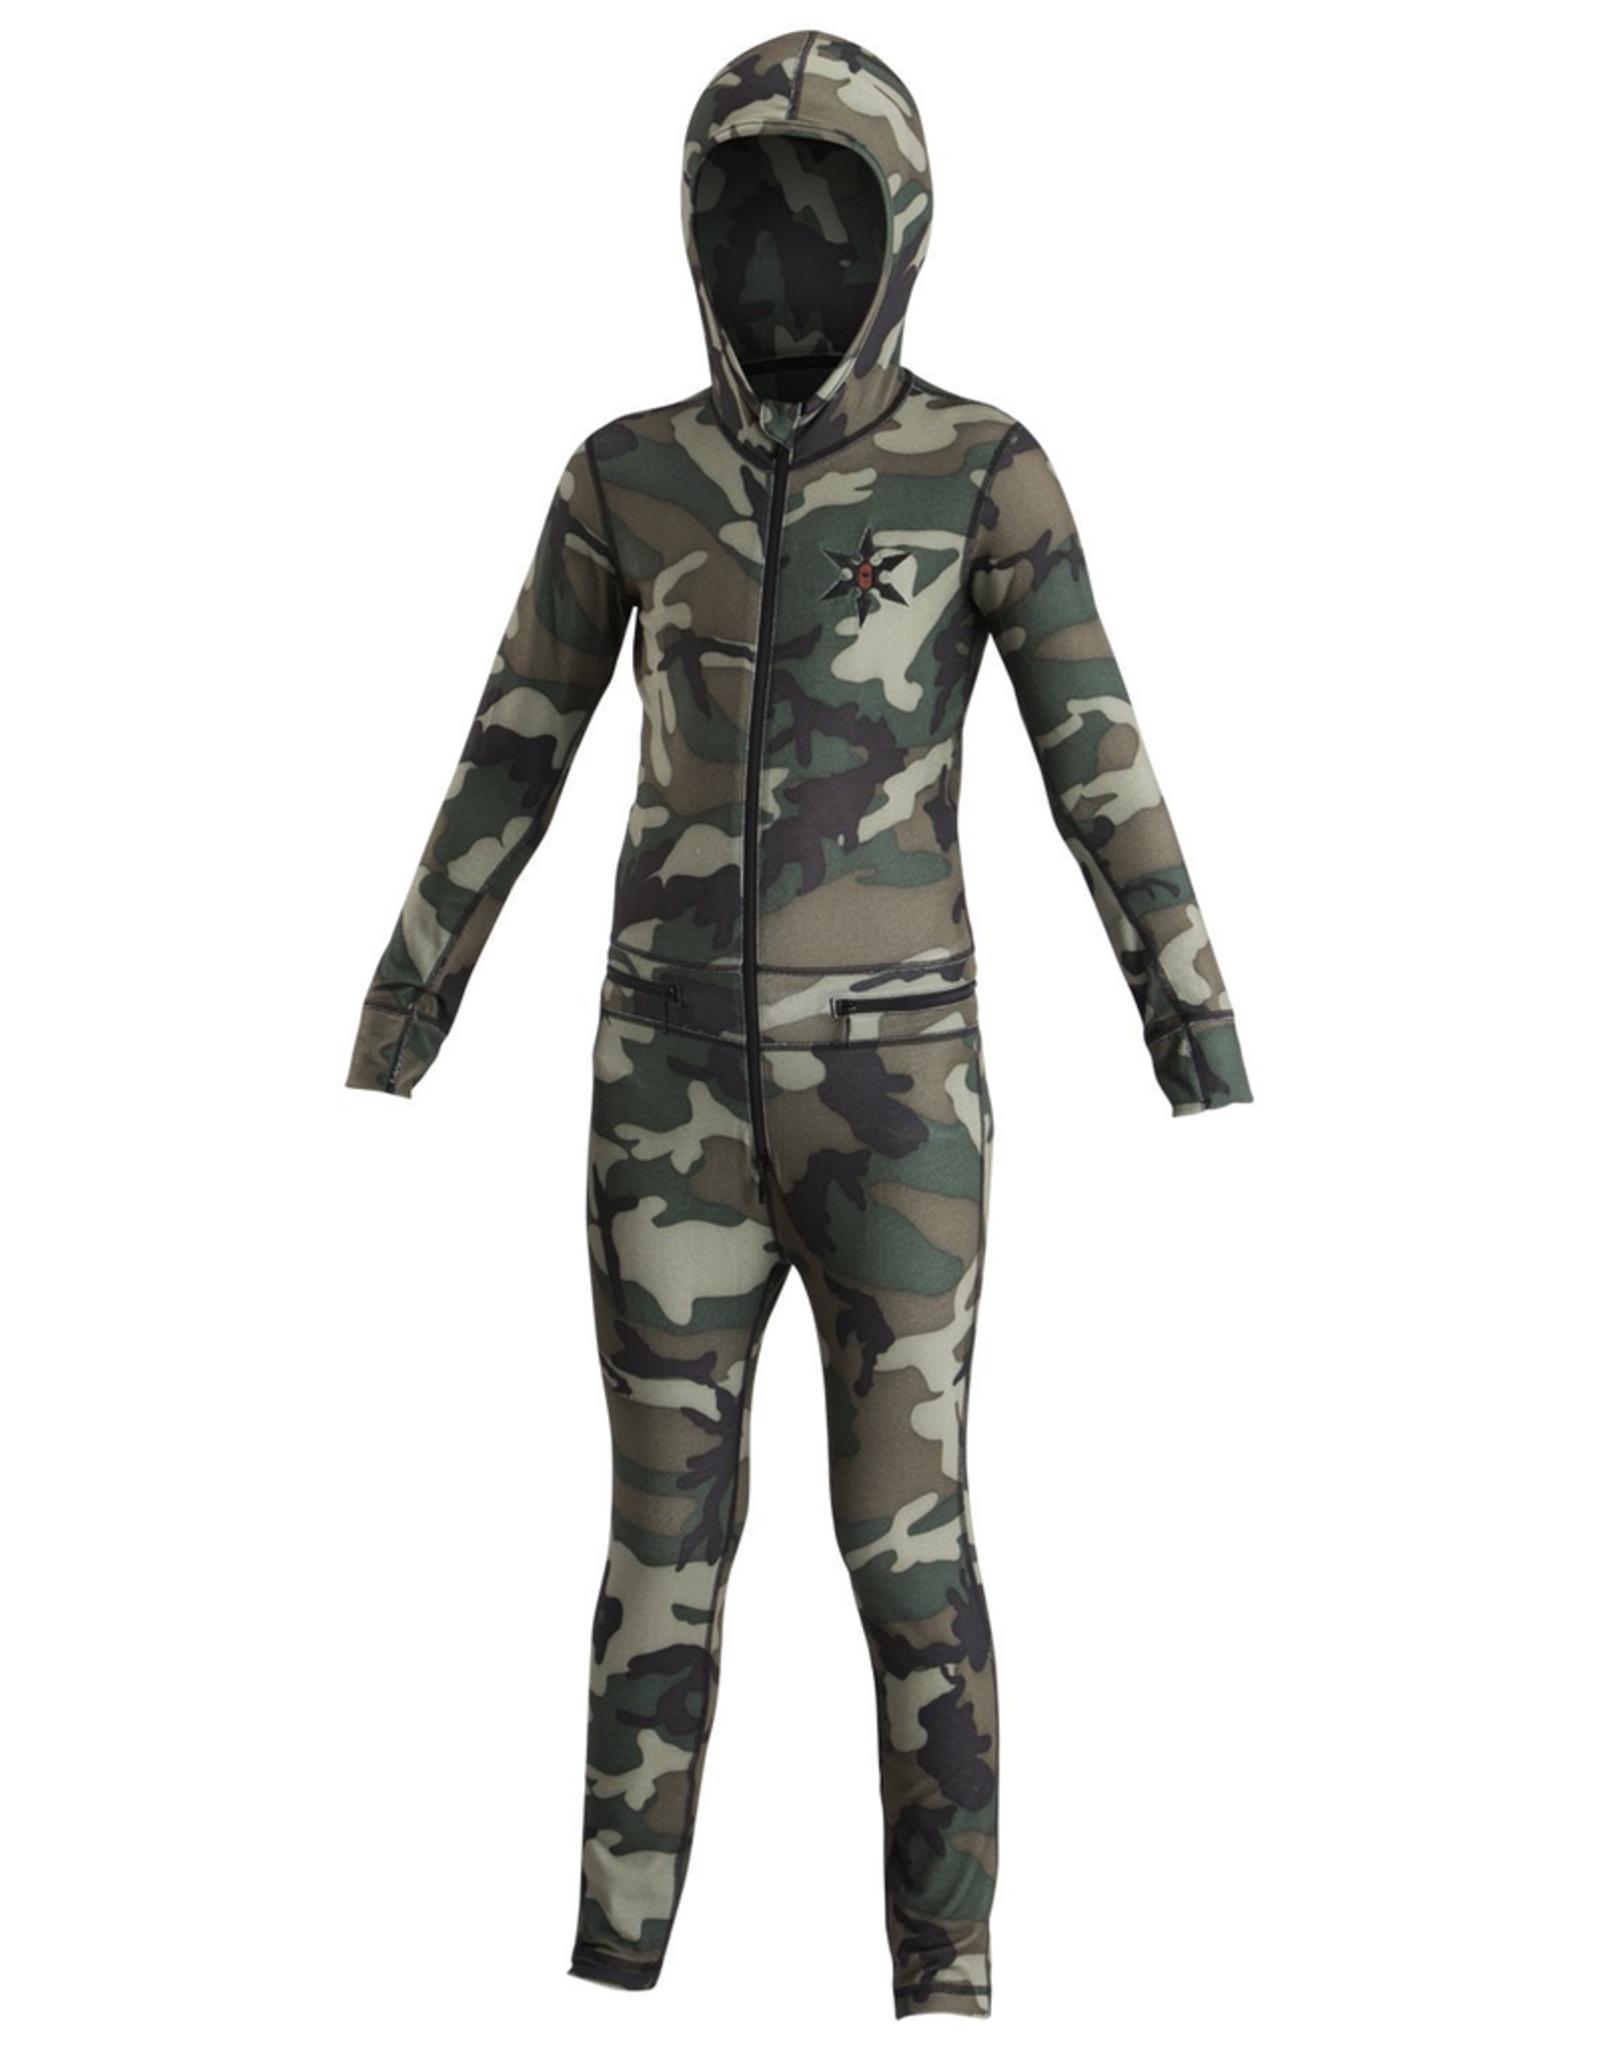 Airblaster Youth Ninja Suit